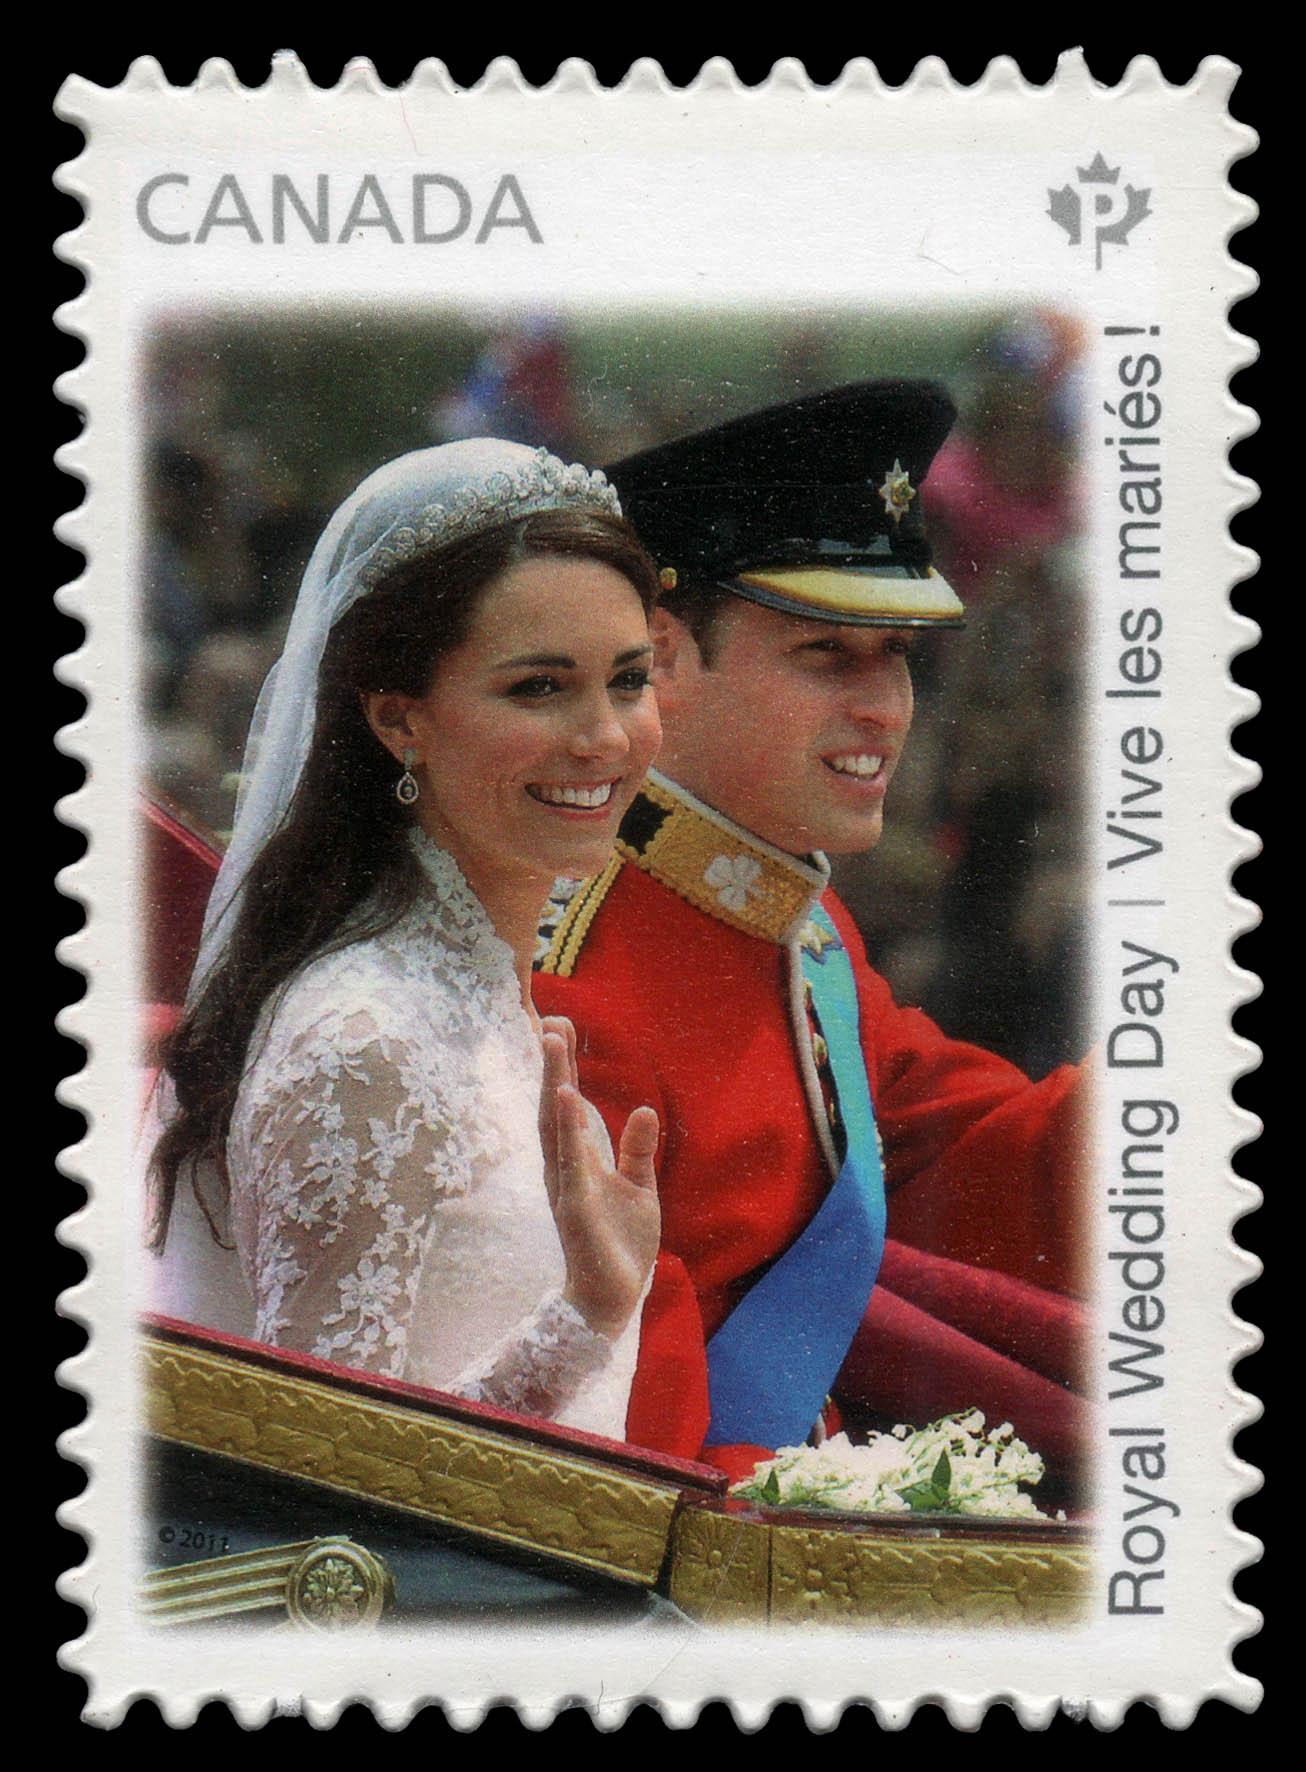 Royal Wedding Day Canada Postage Stamp